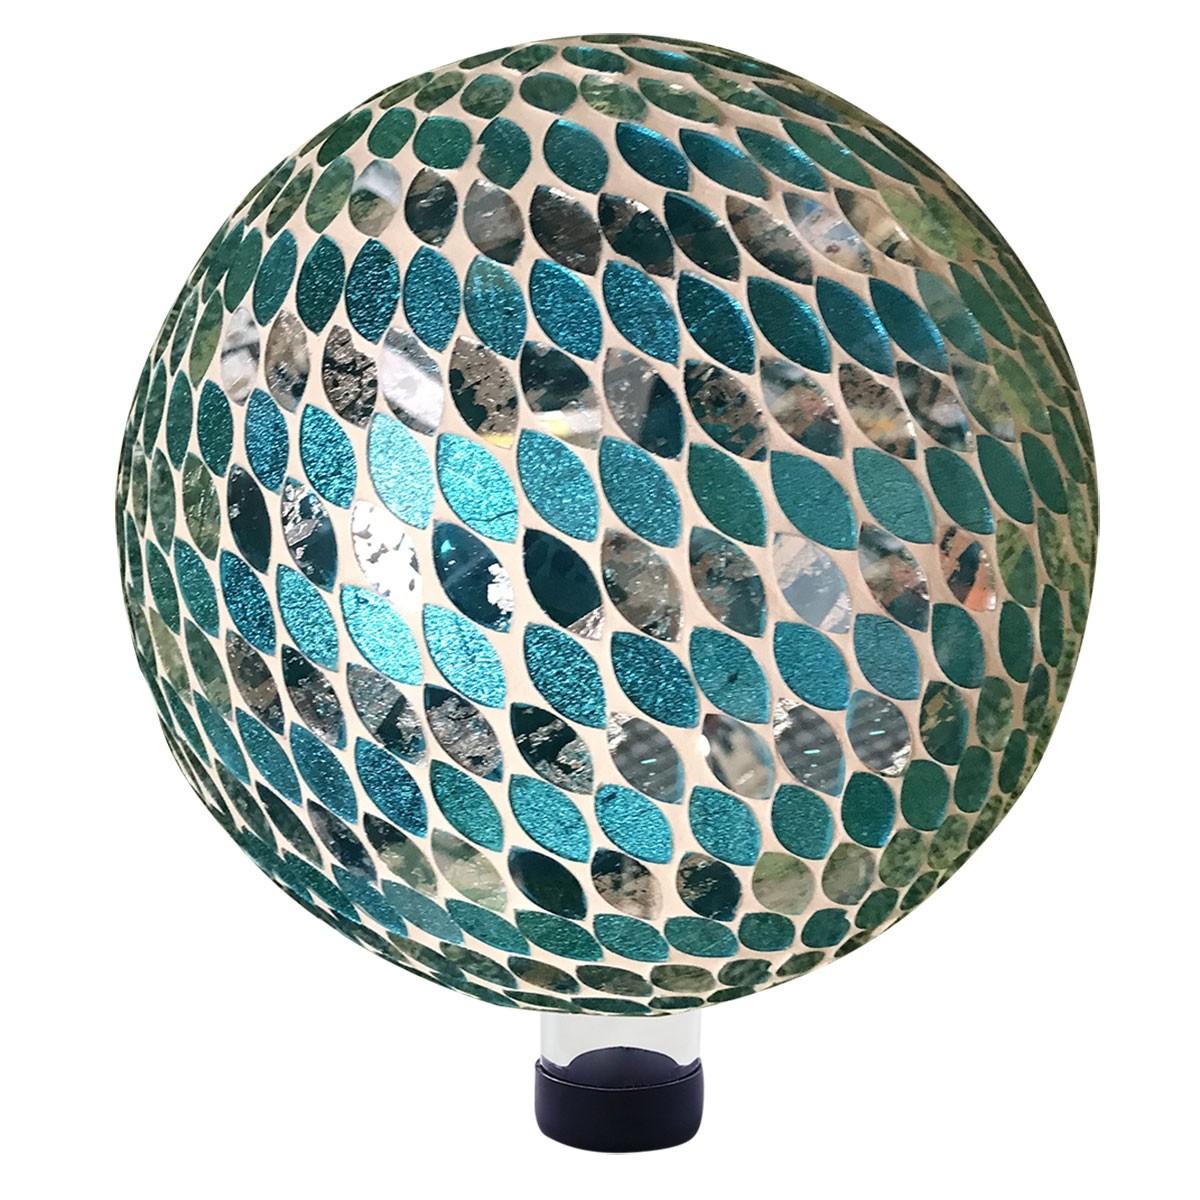 Alpine HGY428 Blue Almond Mosaic Gazing Globe